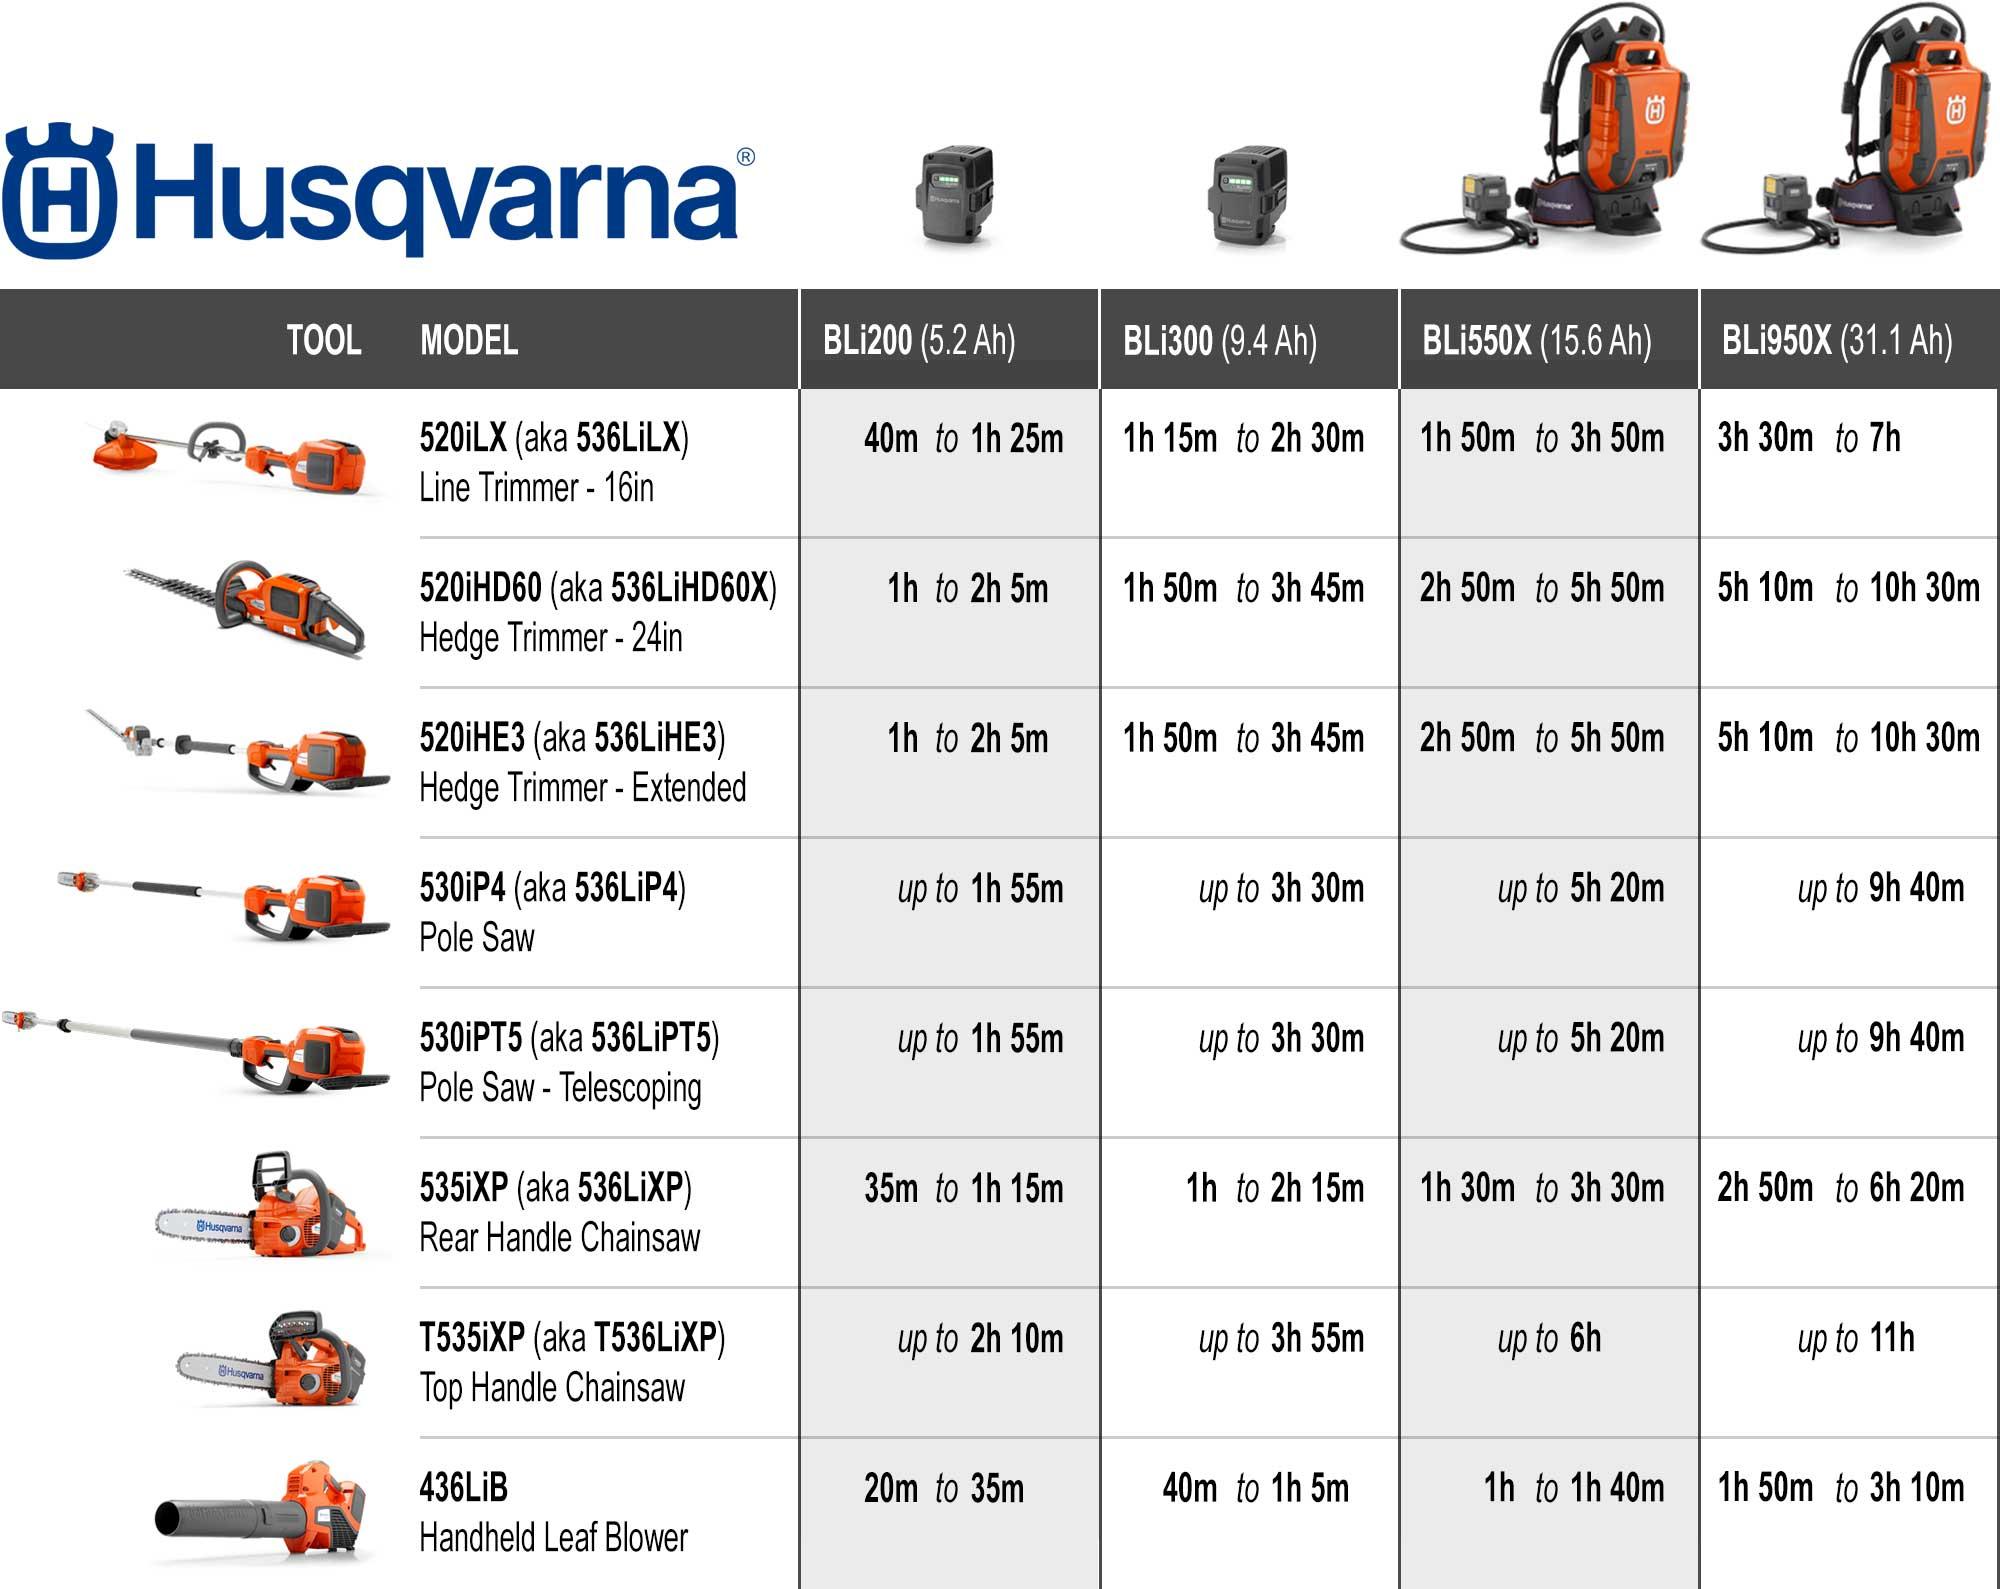 AGZA_HUSQVARNA_Battery_Charging_Chart_01_2000_MED.jpg